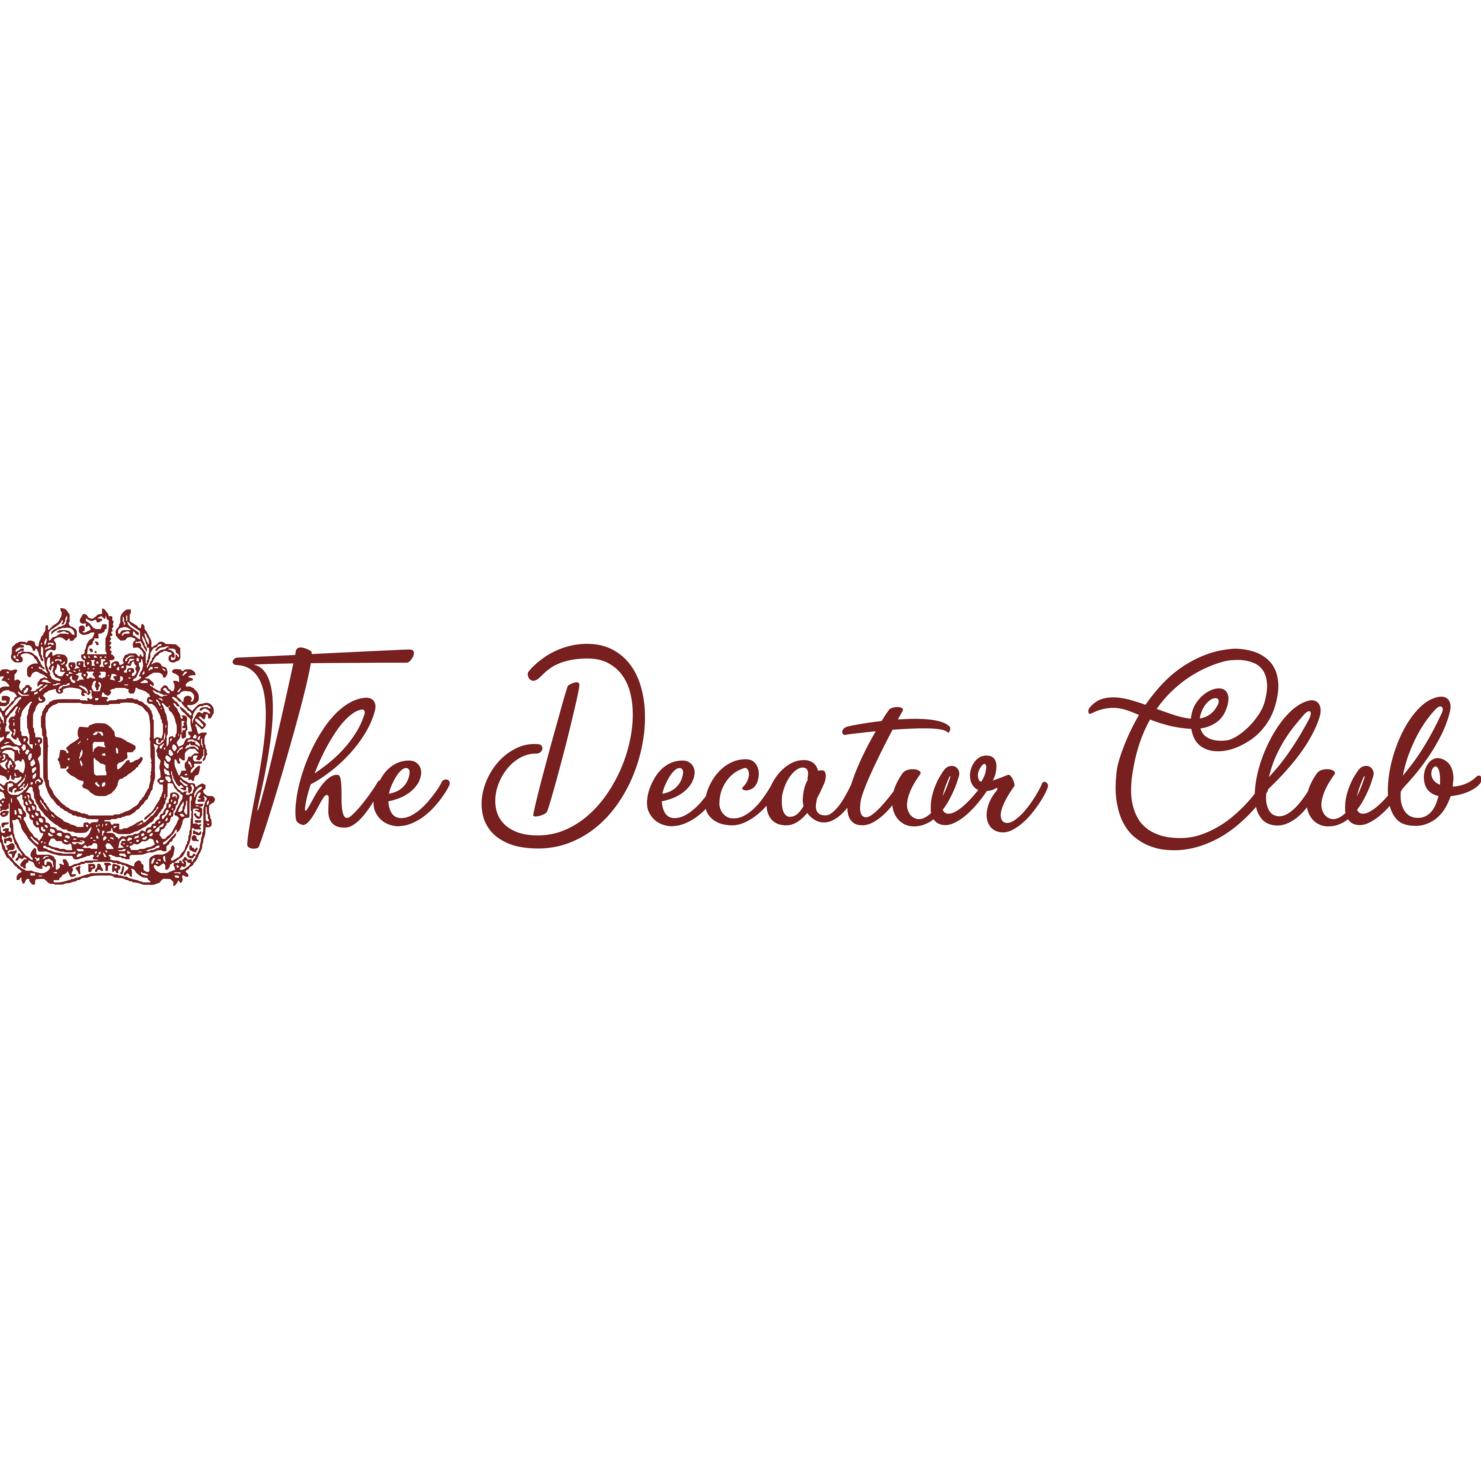 Decatur Club - Decatur, IL - Restaurants